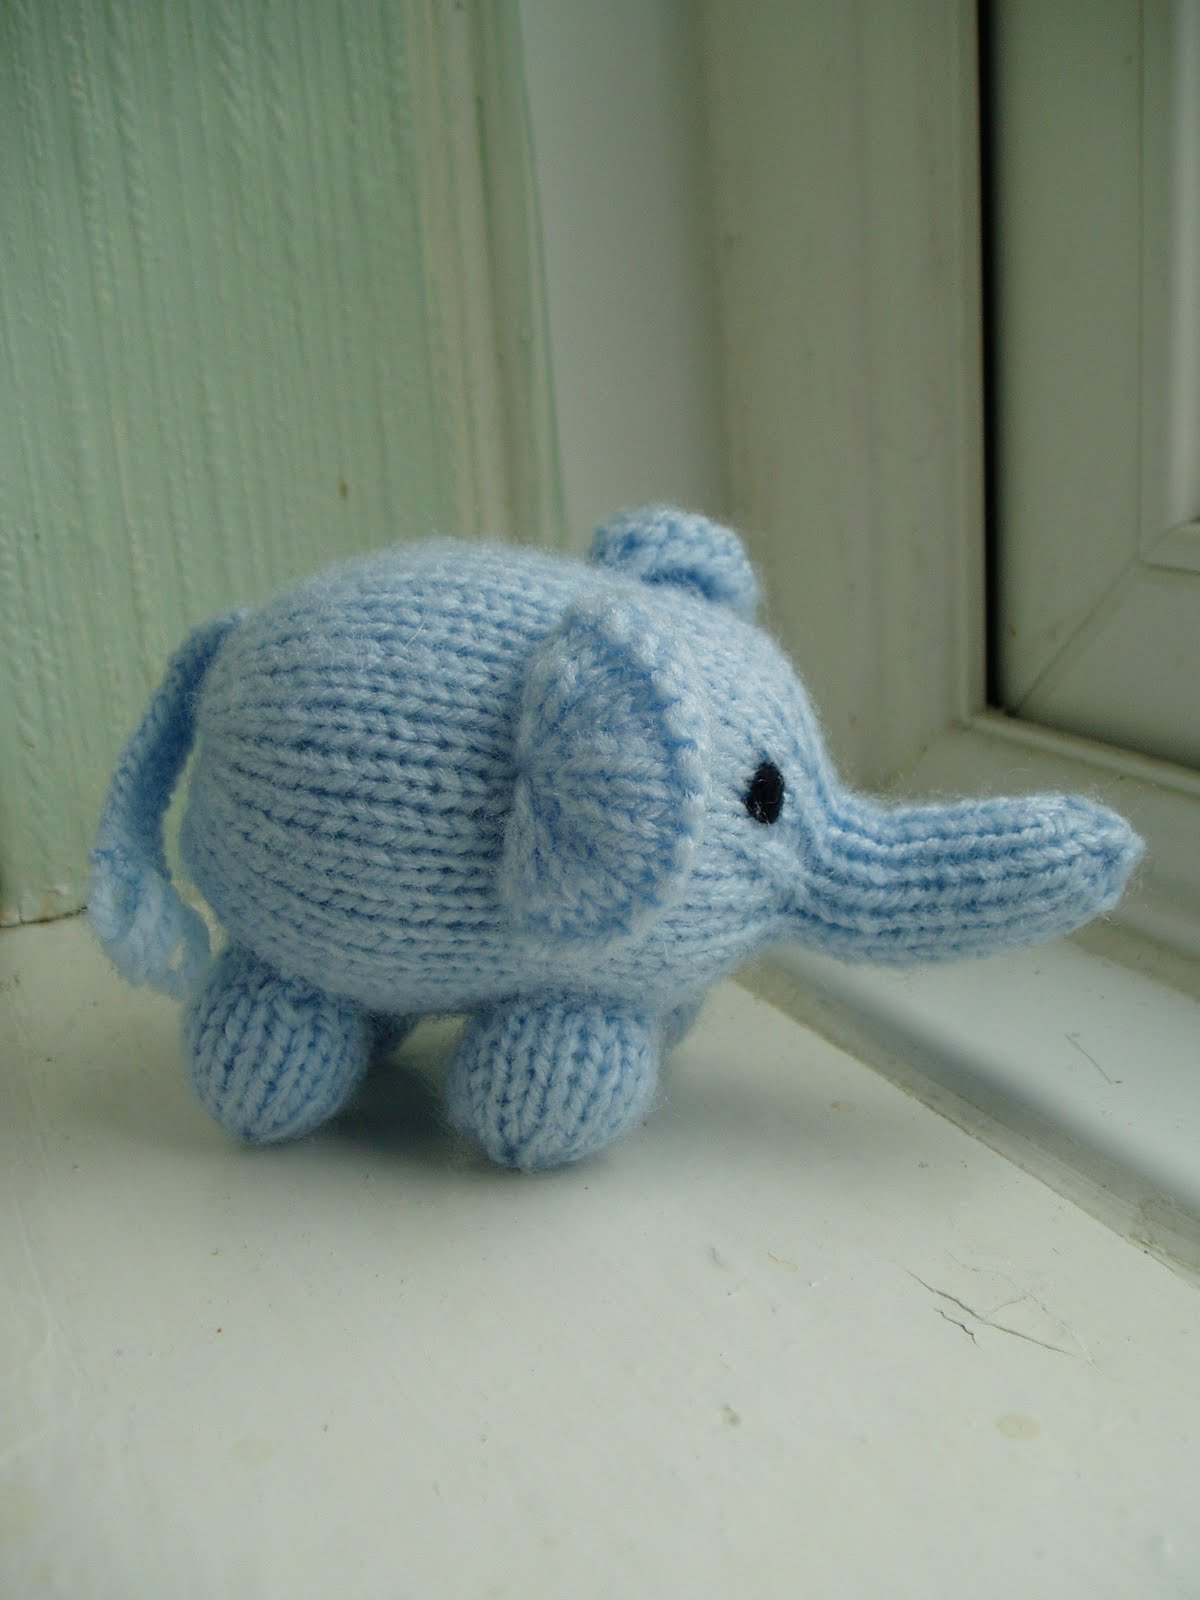 Knitted Elephant Pattern : Free Pattern - Mini Elephant